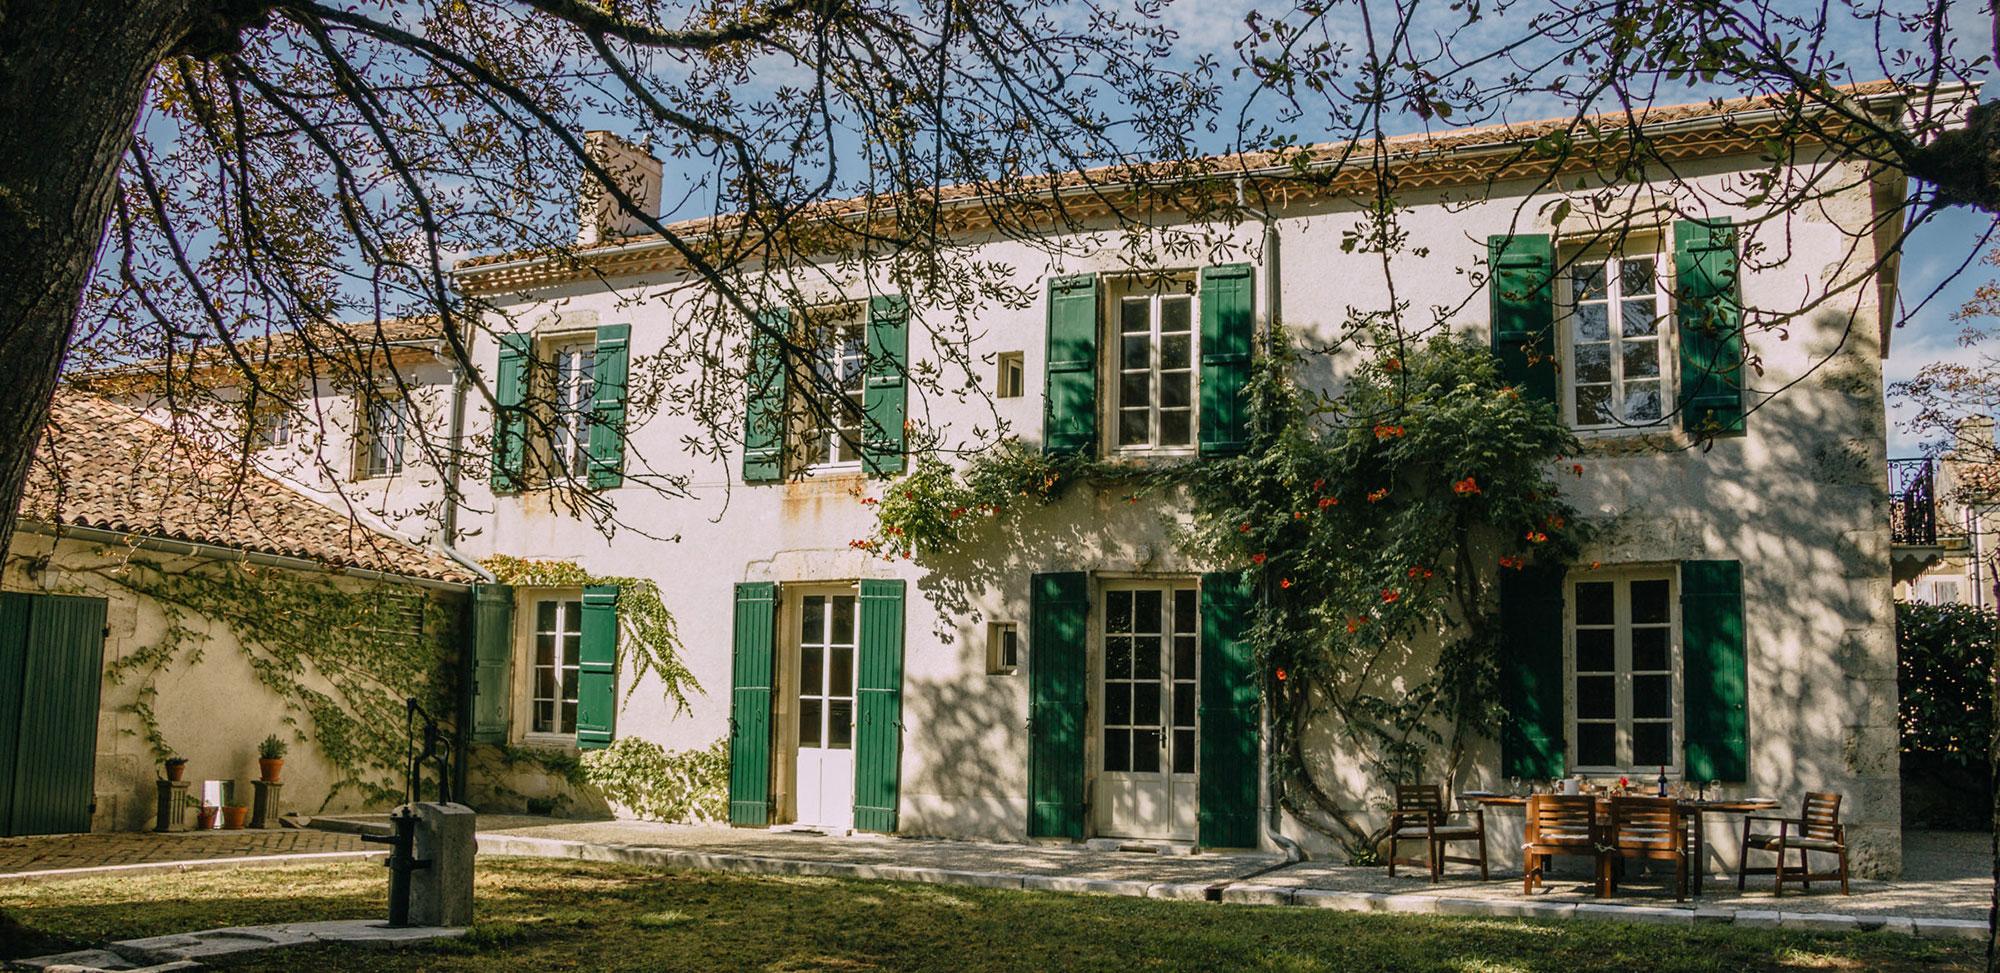 Garden at Studio Faire, South West France